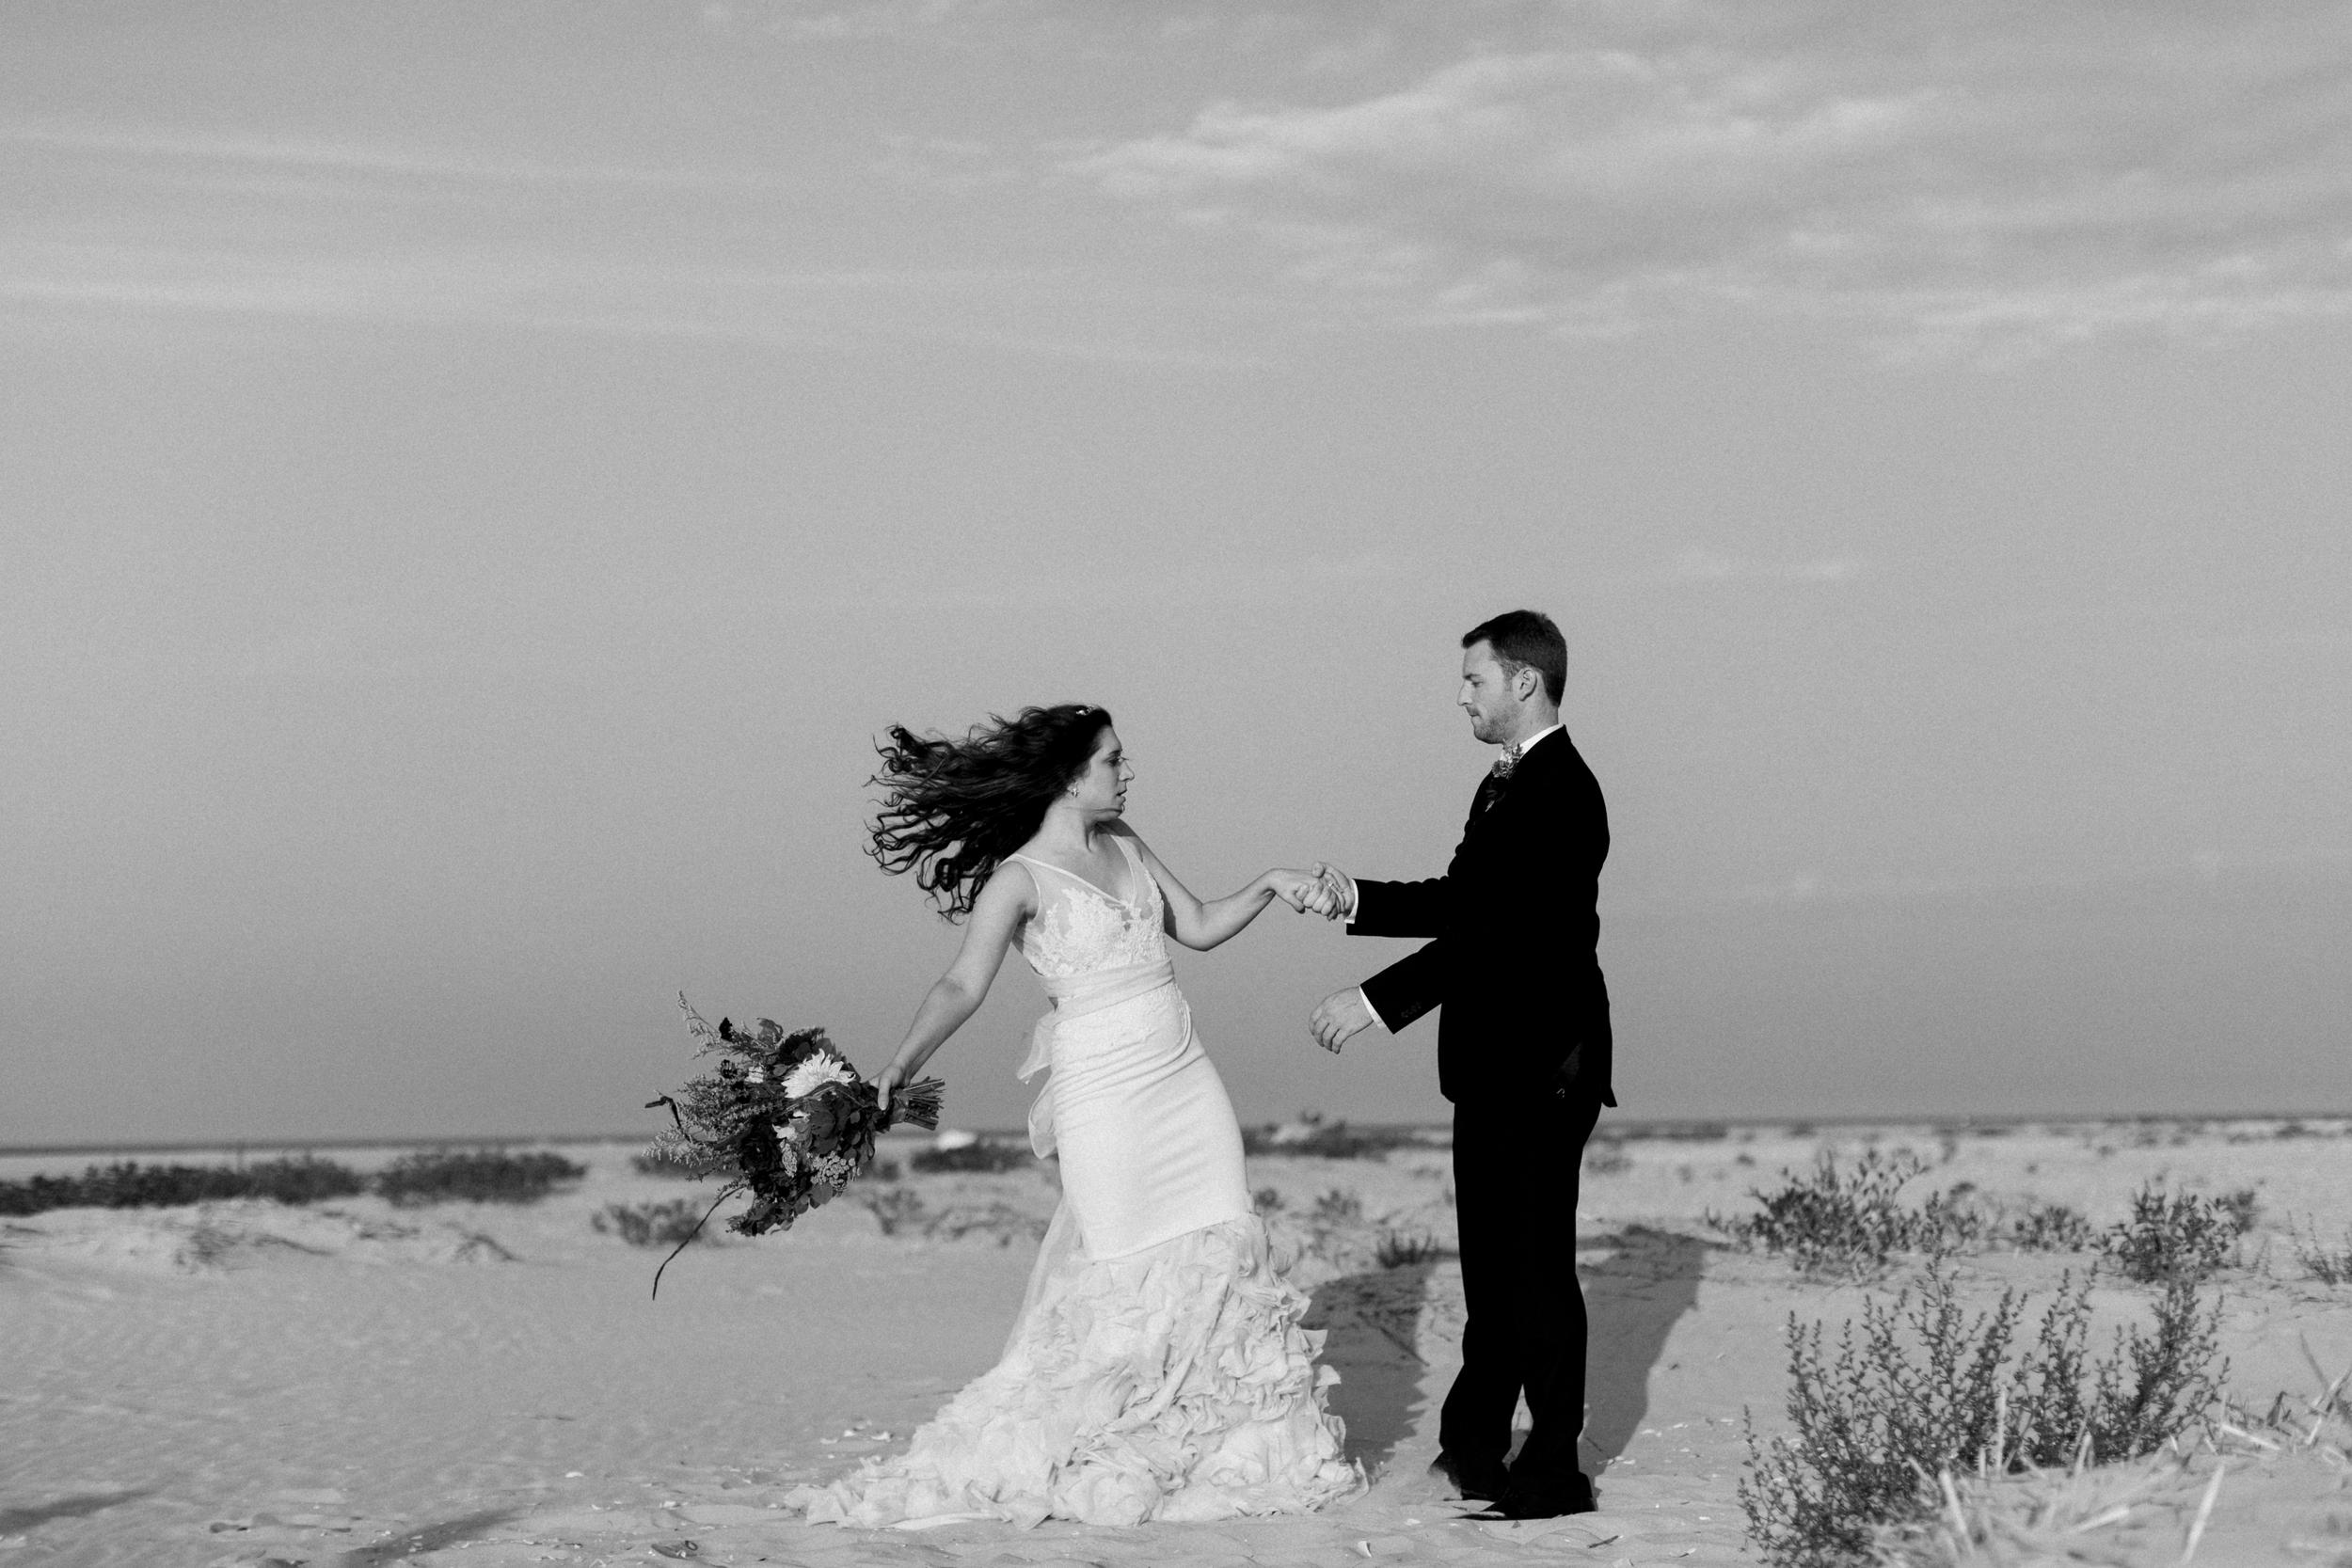 New-Jersey-Wedding-Photographer_Jessica-Cooper-Photography-11.jpg